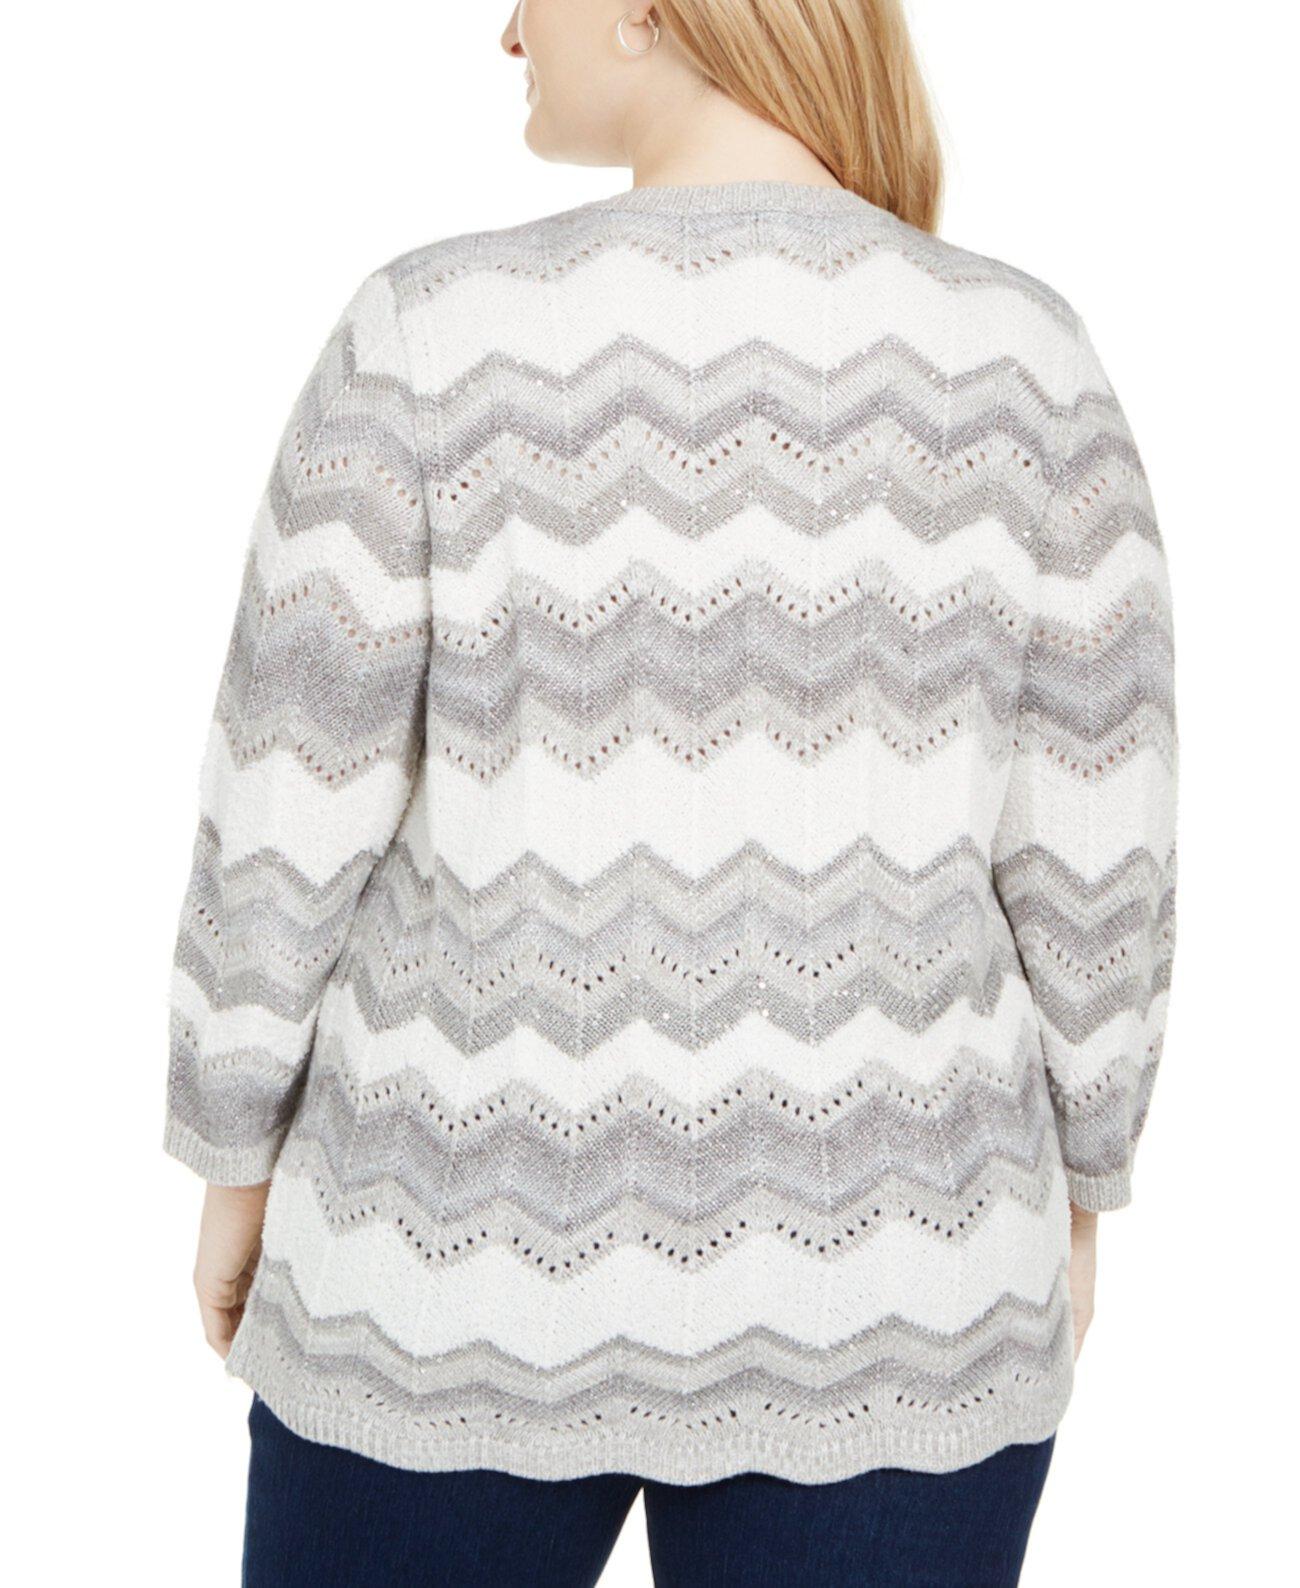 Многоуровневый свитер женской формы Chevron Lake Size Alfred Dunner